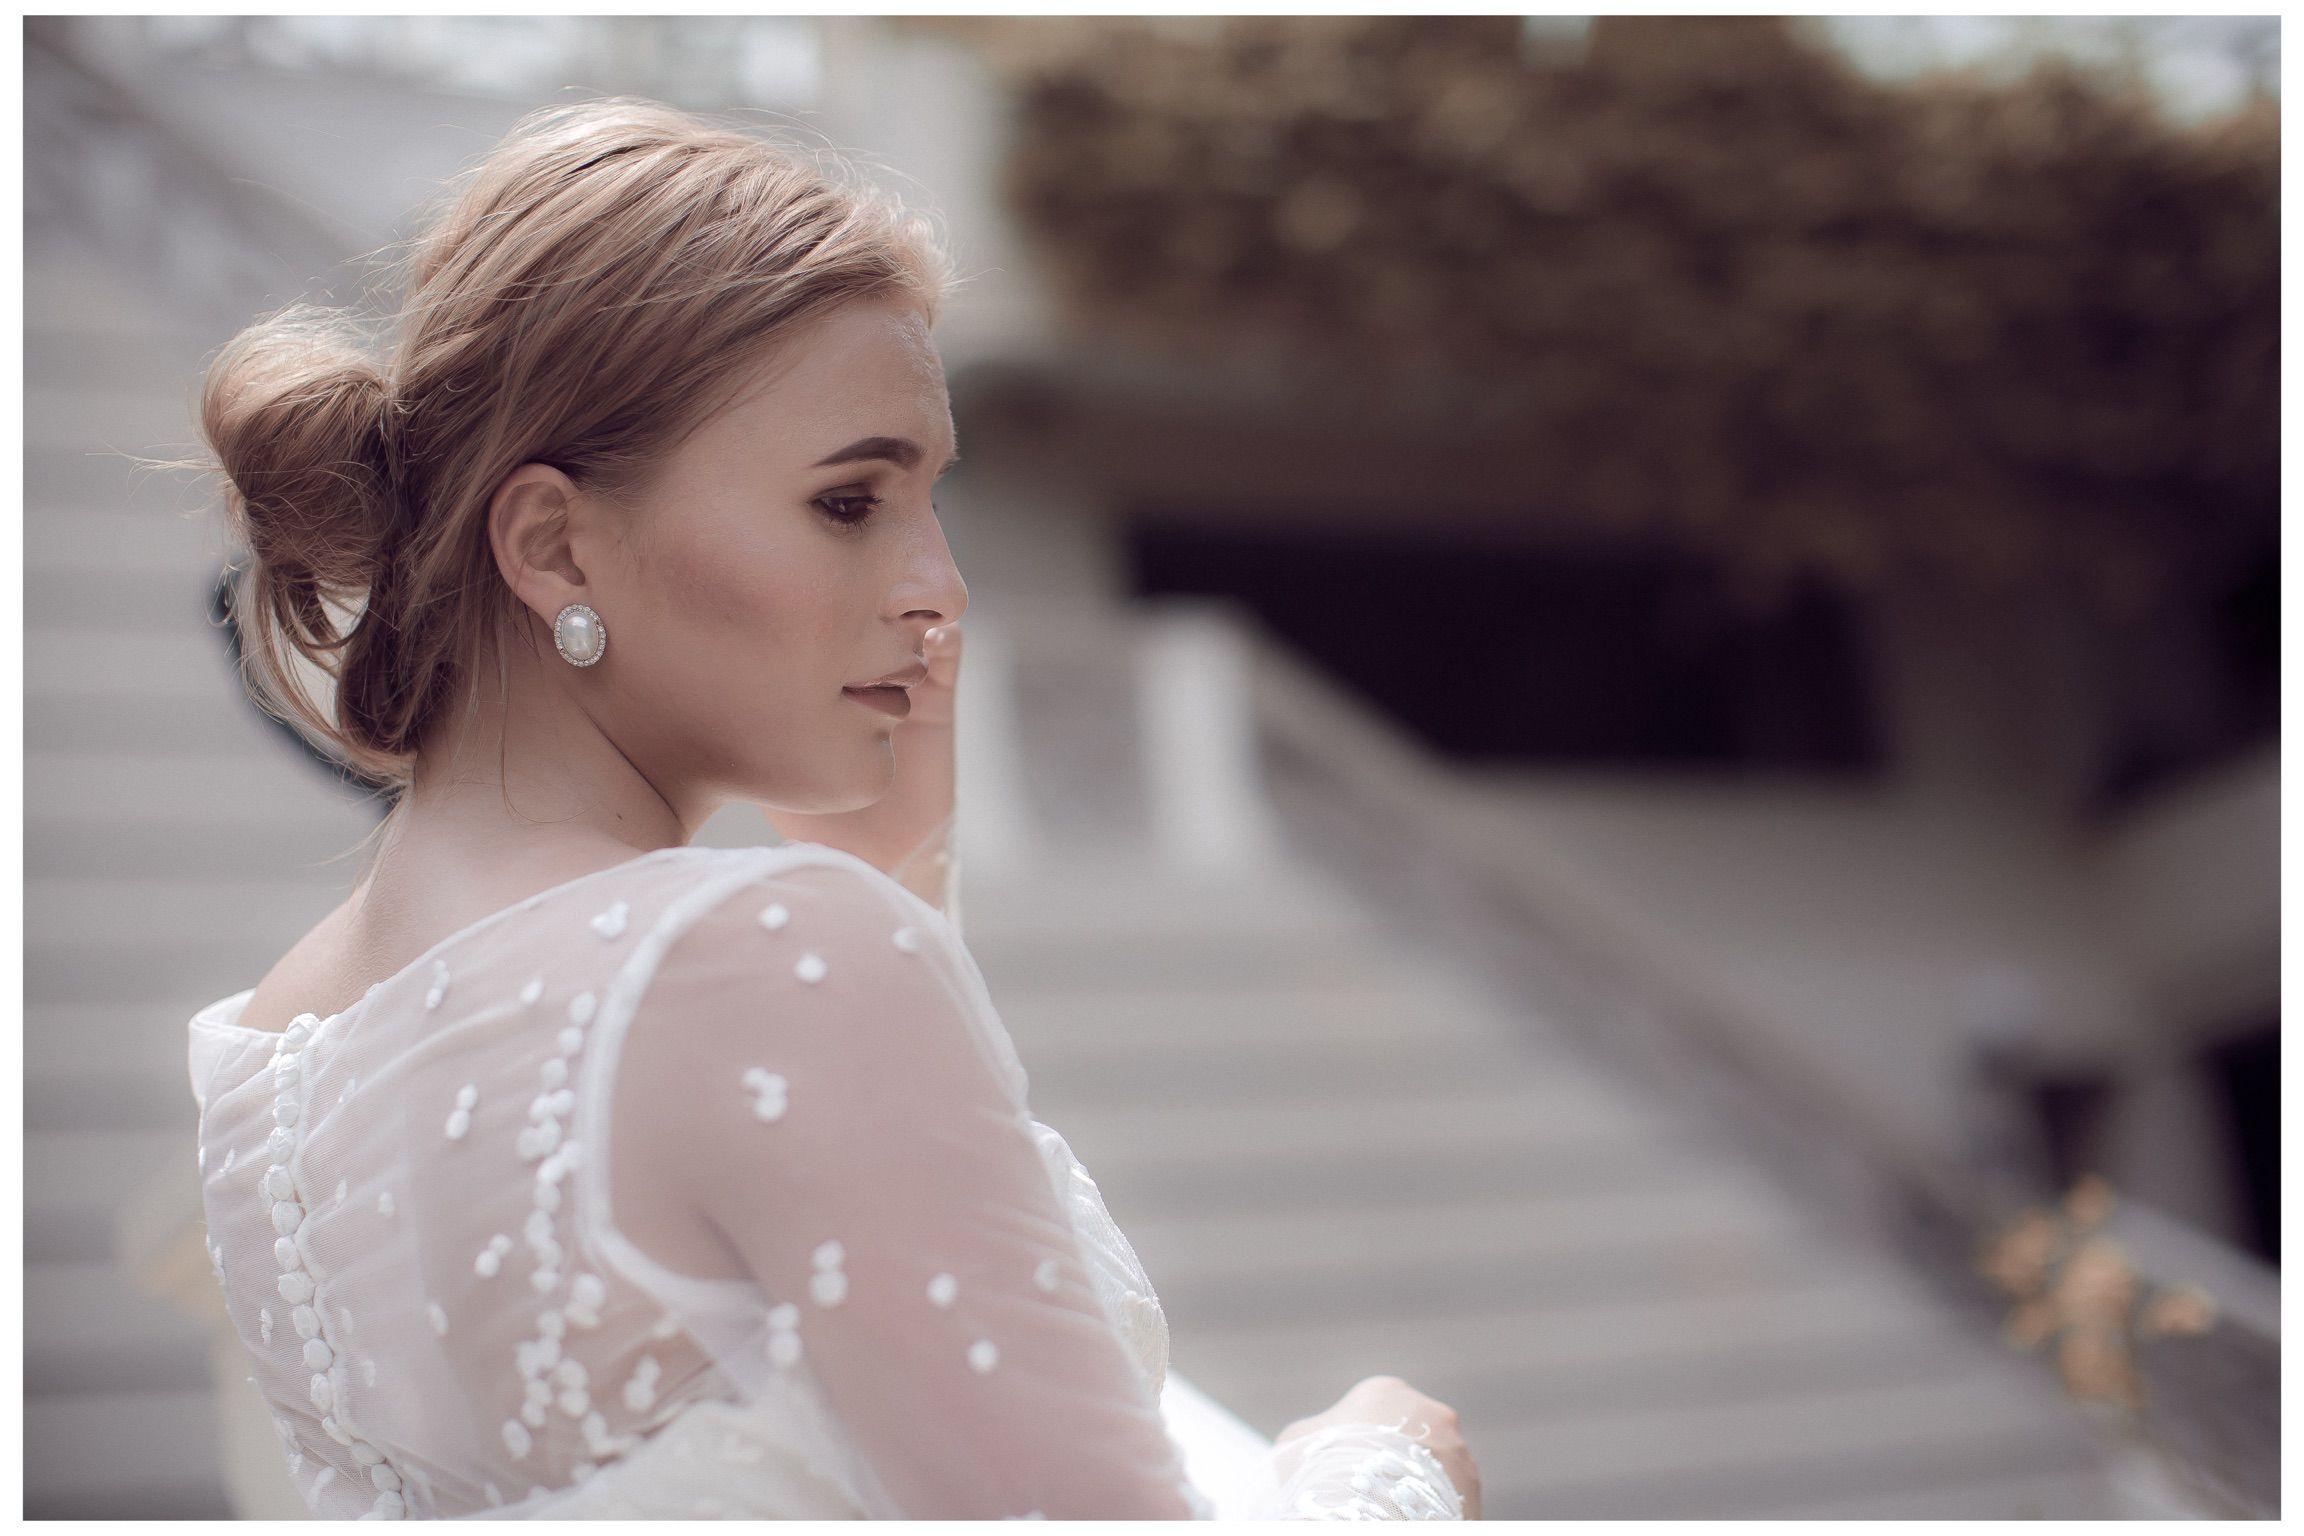 Airahshazana instagram shairahshazana wedding dress